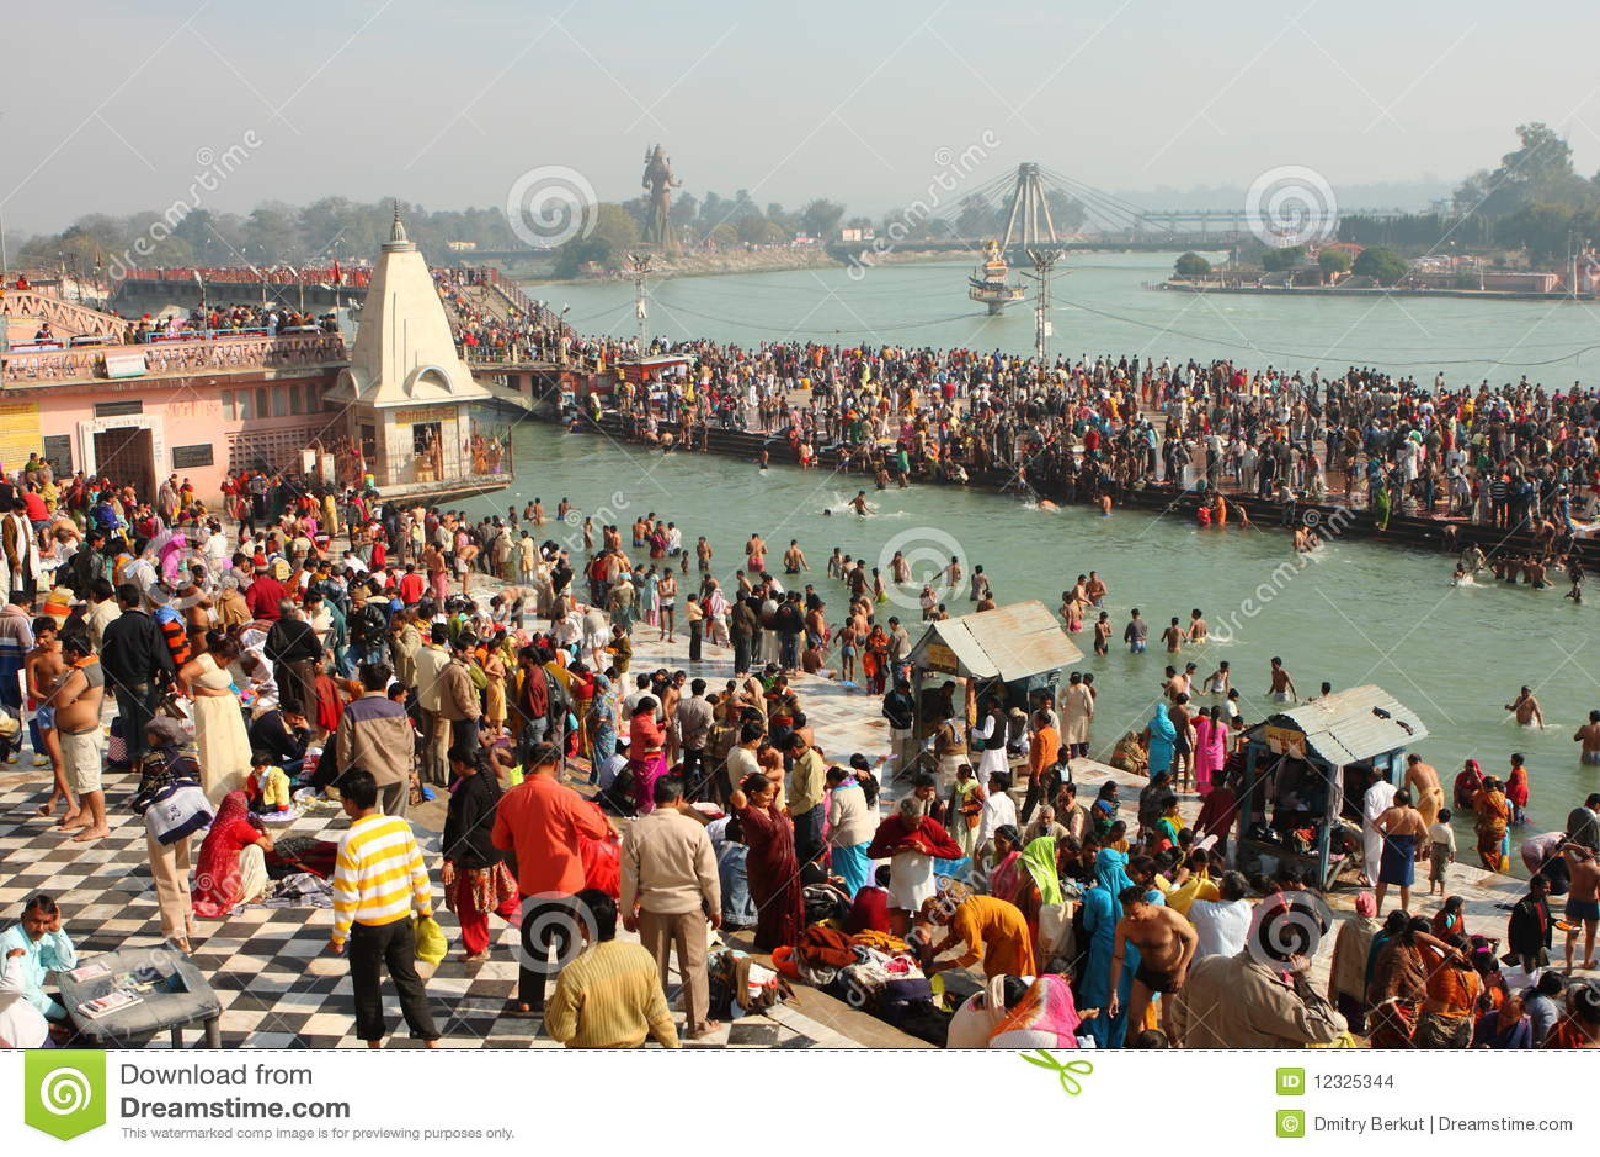 Religious Festival Makar Sankranti In India Editorial Stock Image ...